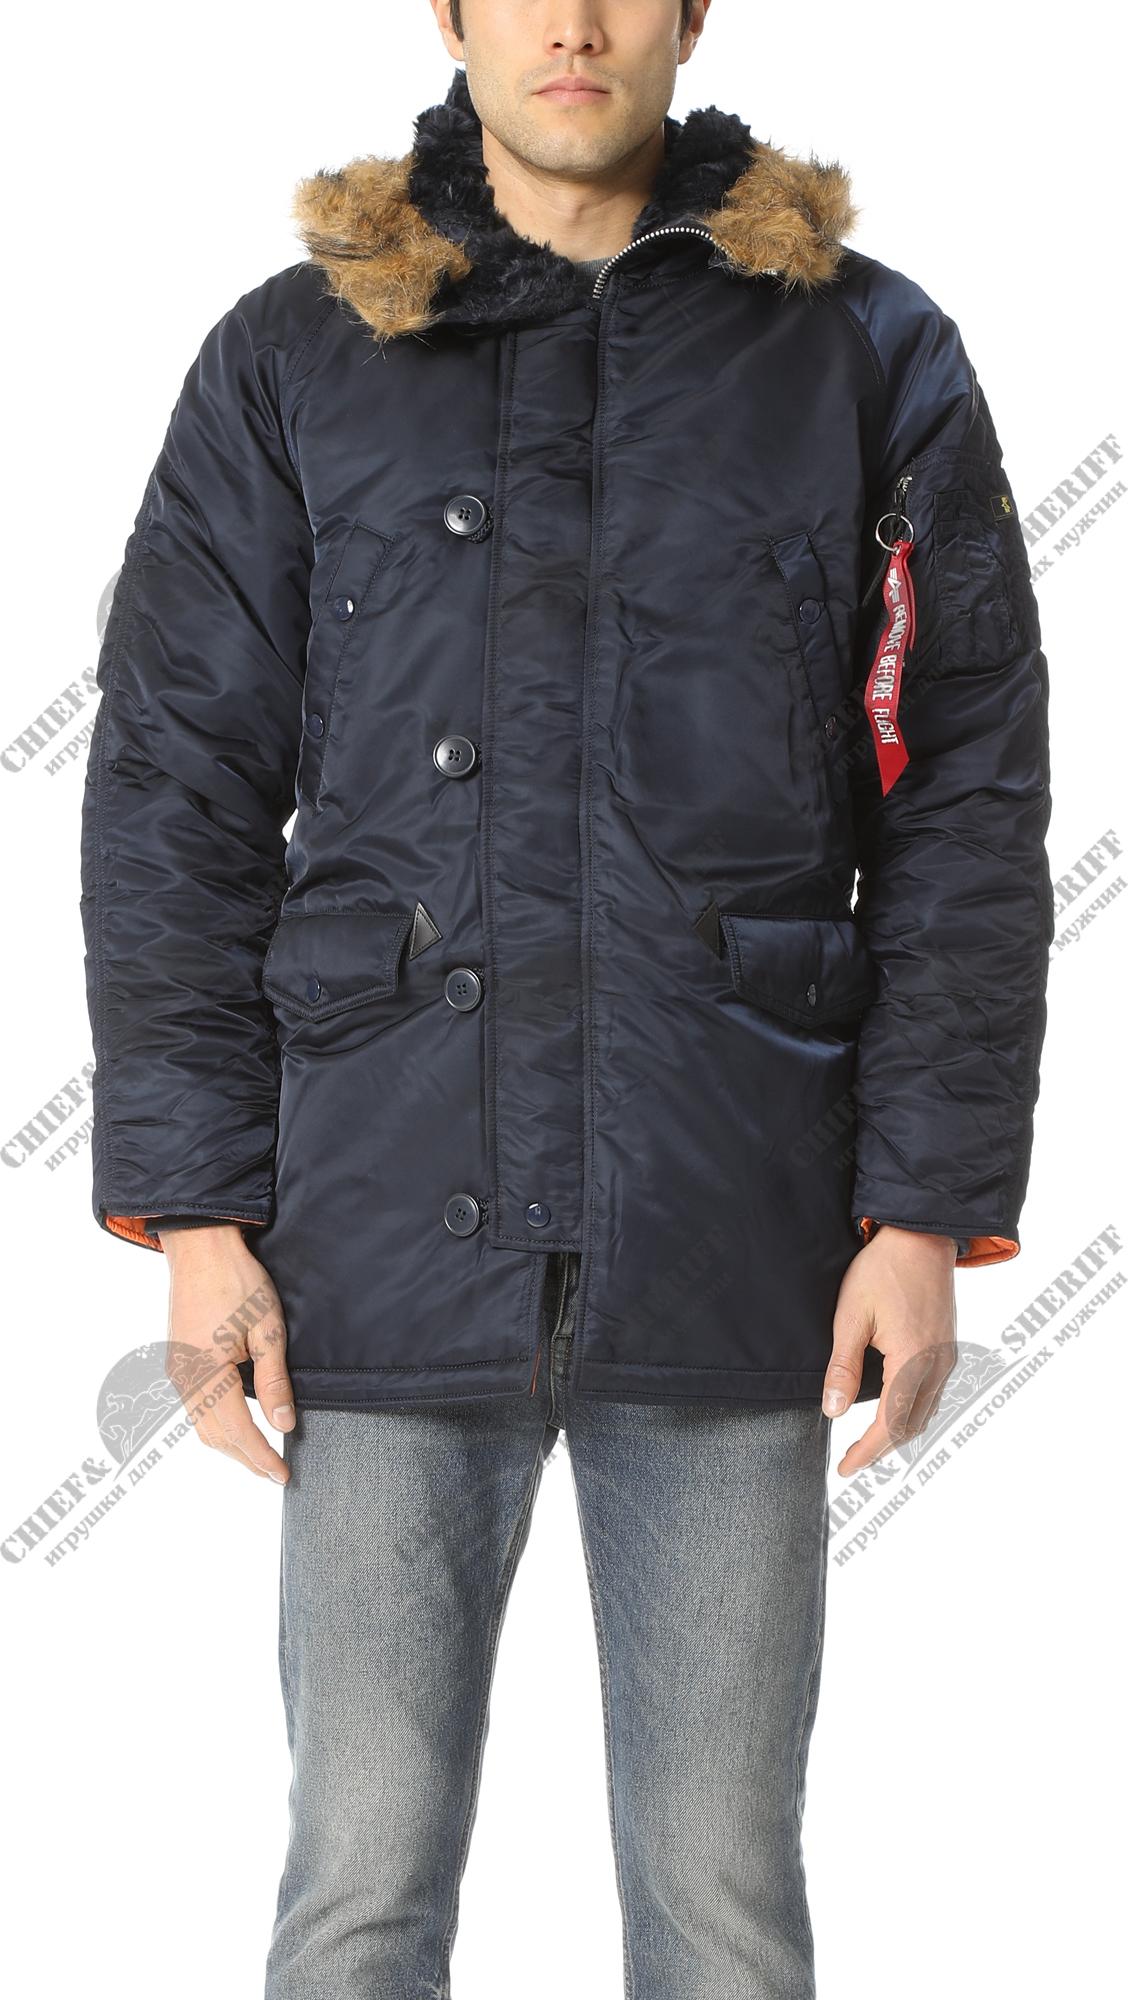 96d046612aa0f ... Куртка аляска Alpha Industries slim Fit N-3B, Parka, blue-orange ...